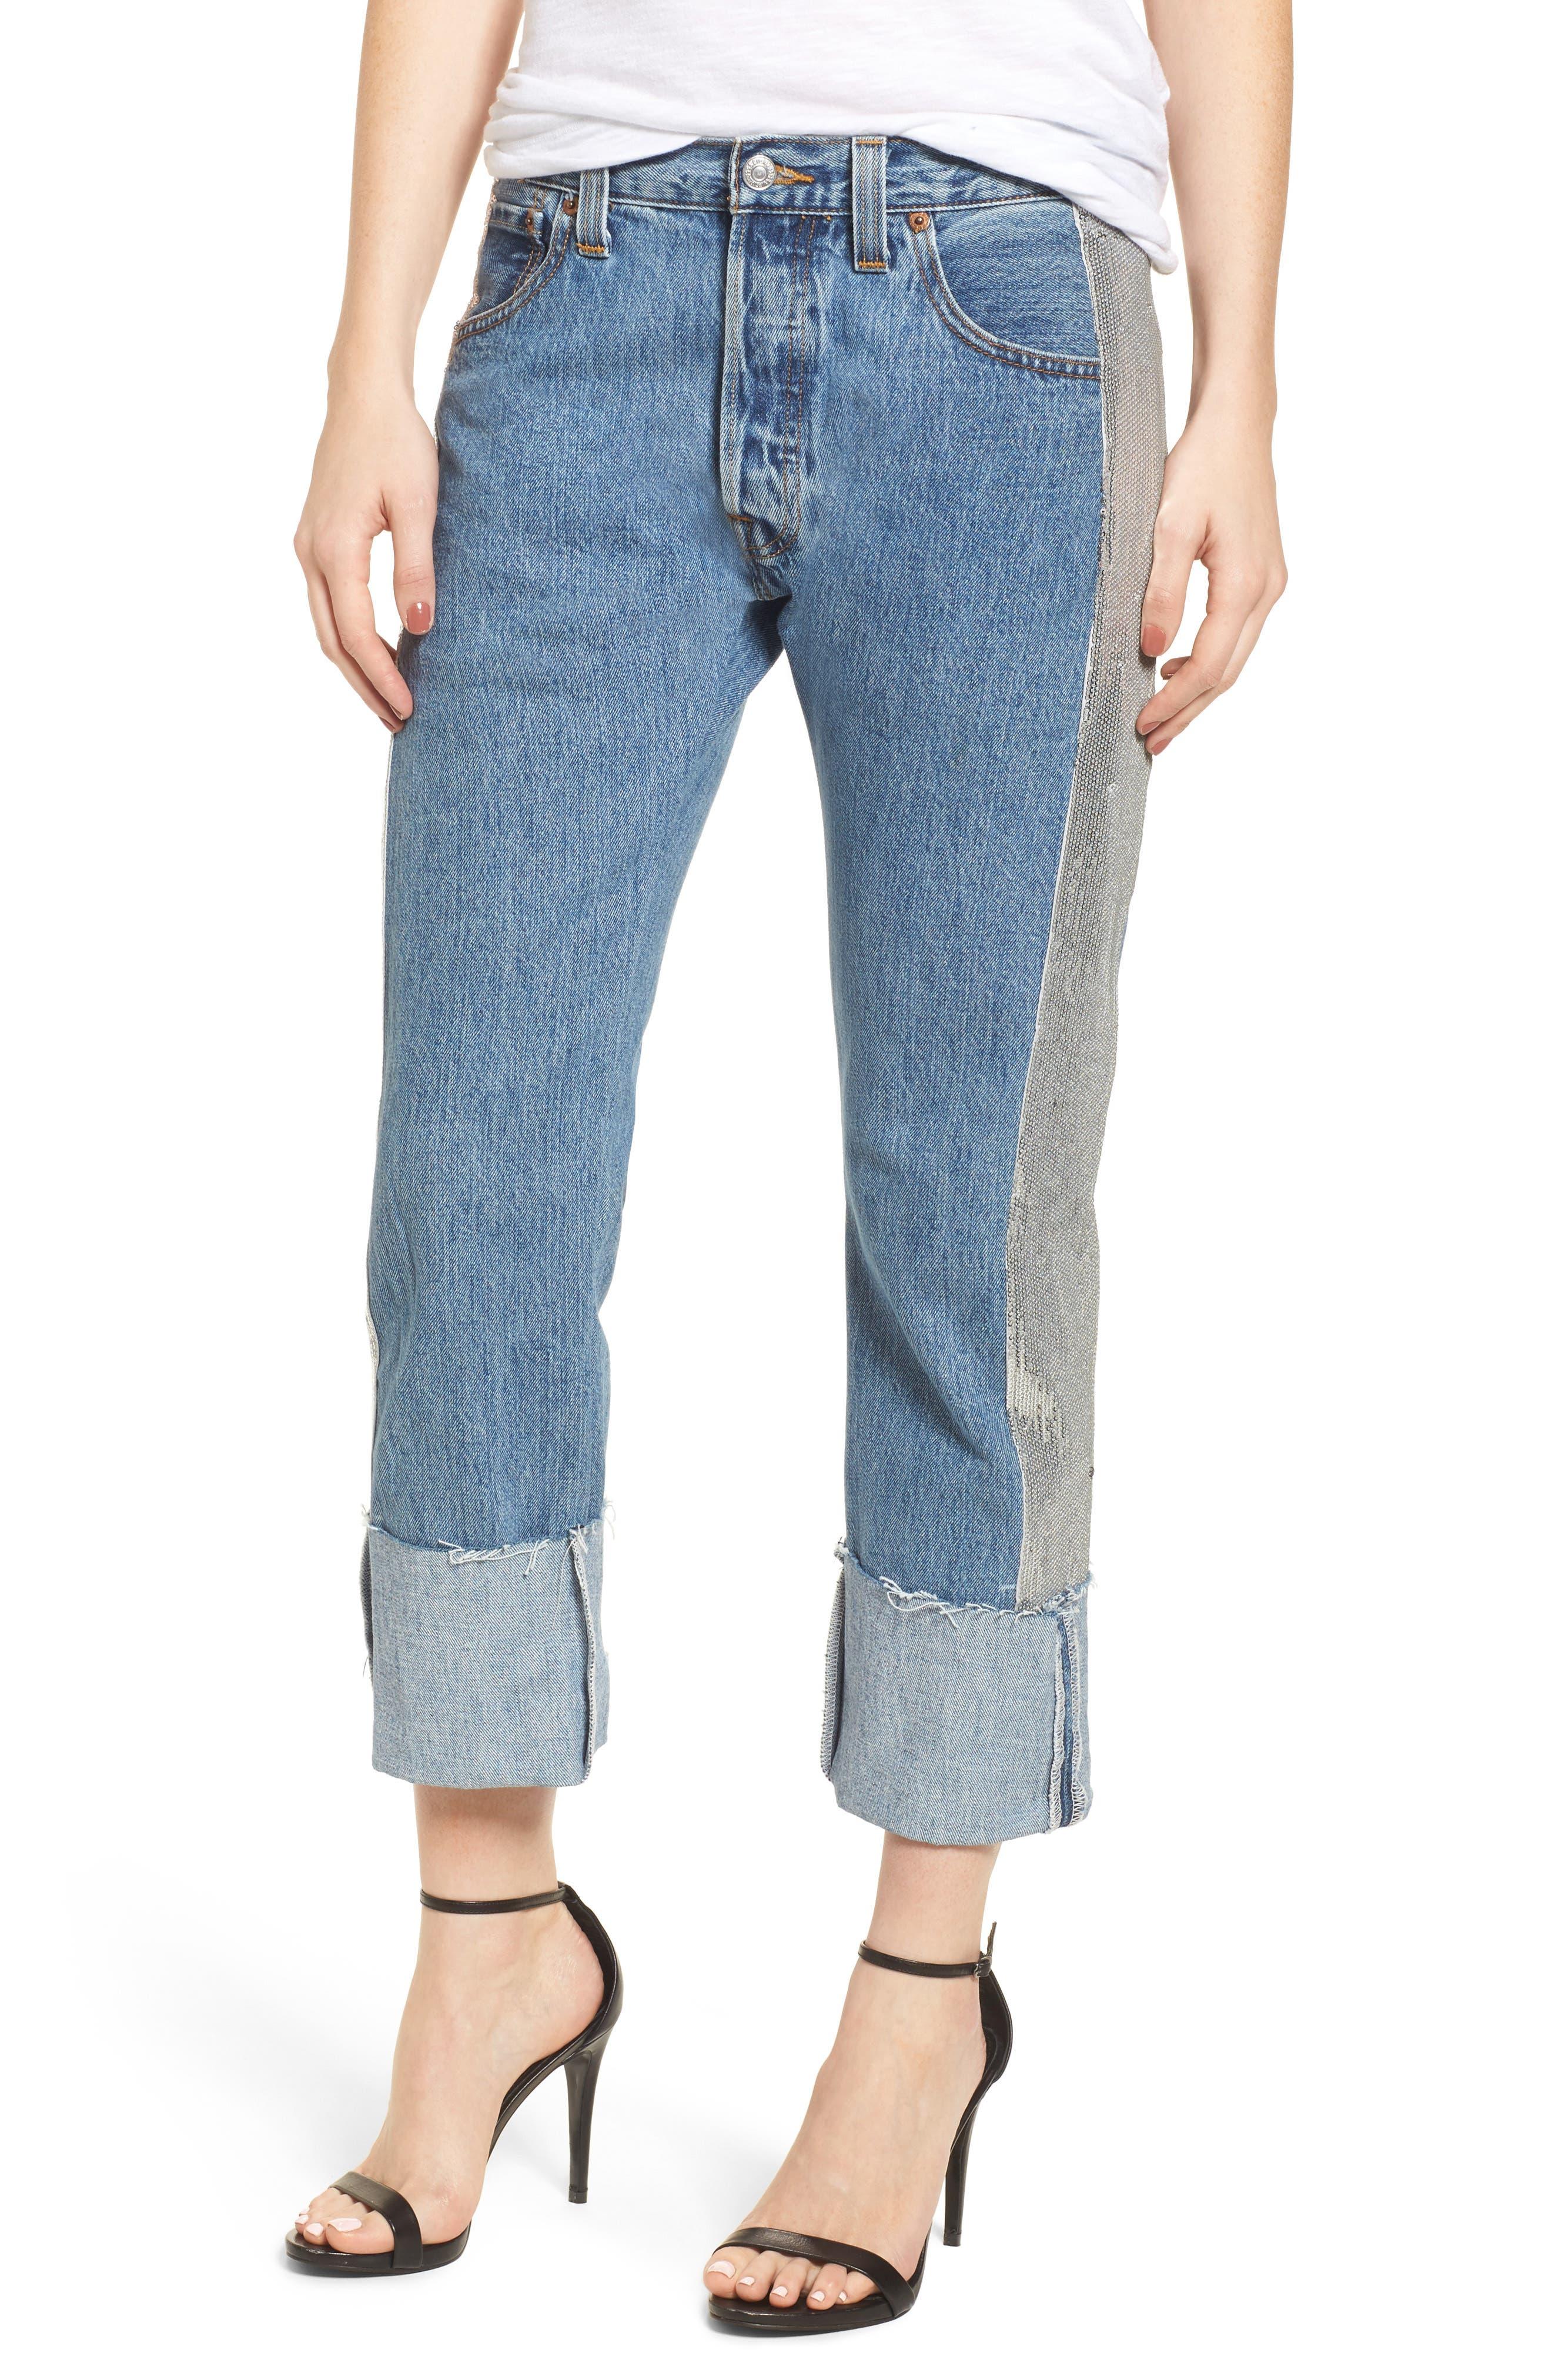 Sequin Boyfriend Jeans,                             Main thumbnail 1, color,                             Medium Wash/ Silver